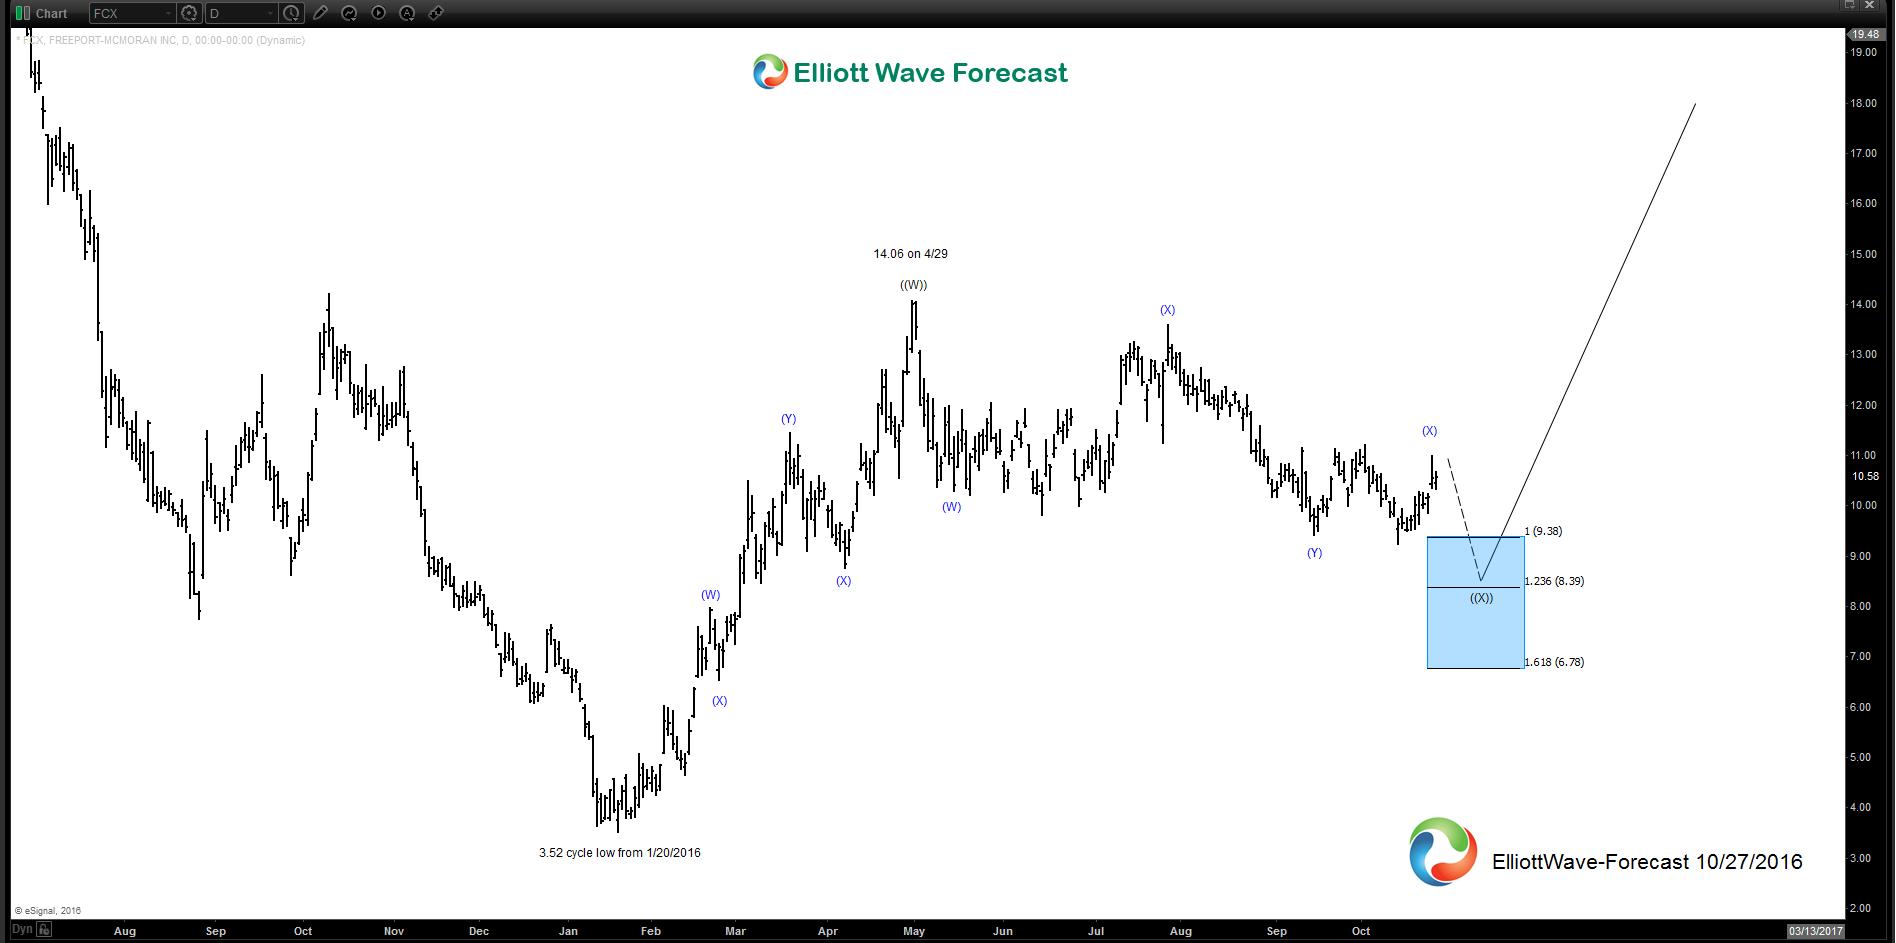 Daily Elliott Wave Analysis of Freeport-McMoRan Inc. $FCX